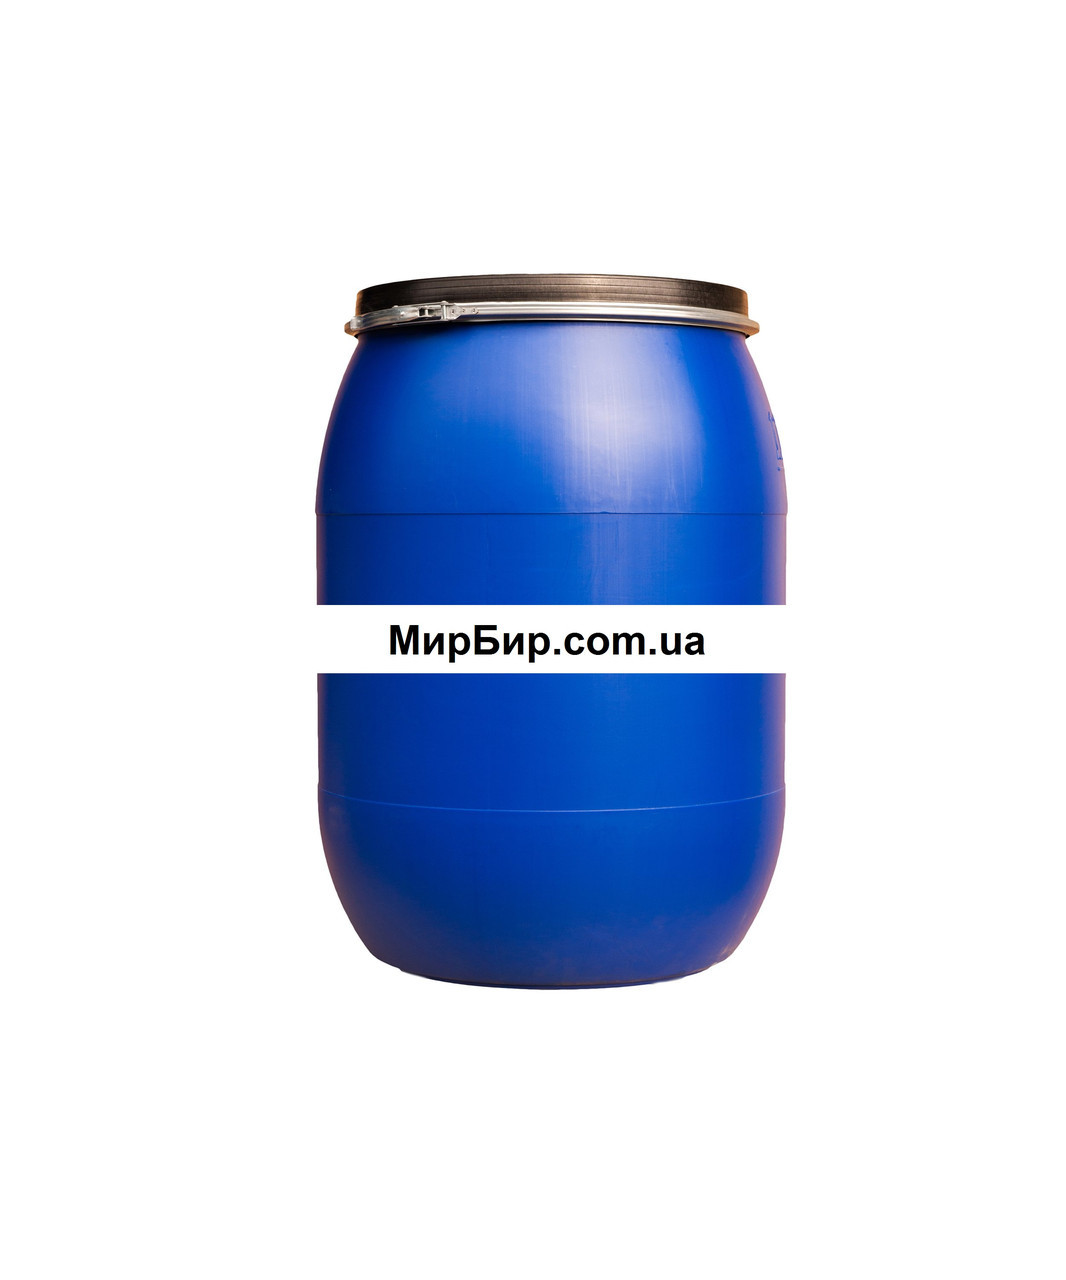 Бочка с зажимом, 60 литров